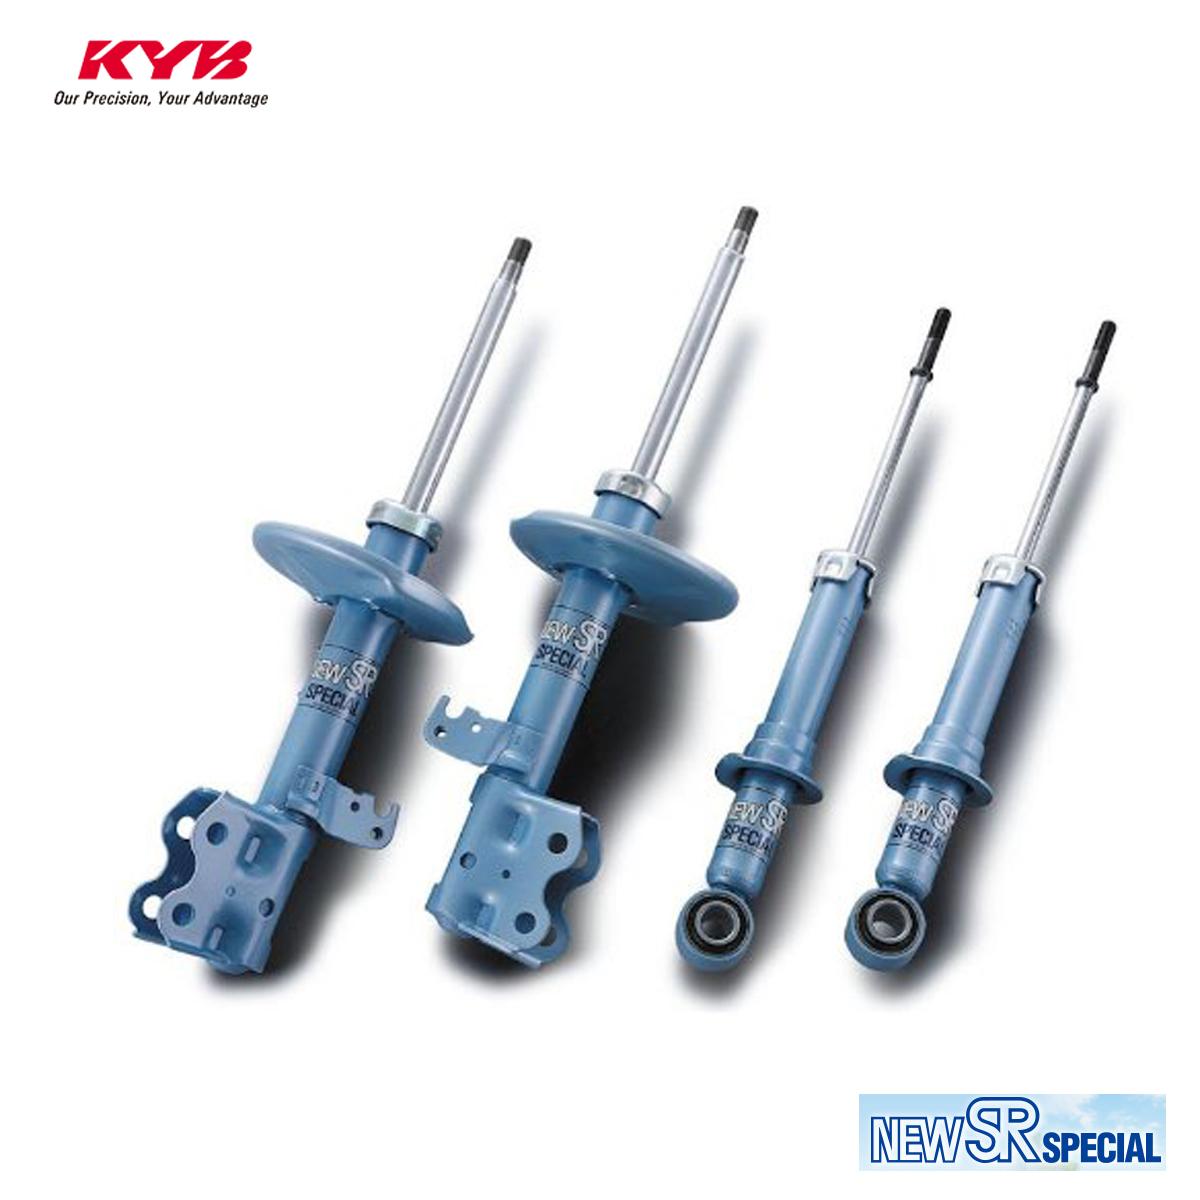 KYB カヤバ タント タントカスタム L375S ショックアブソーバー 1台分 NEW SR SPECIAL NS-53941100 配送先条件有り